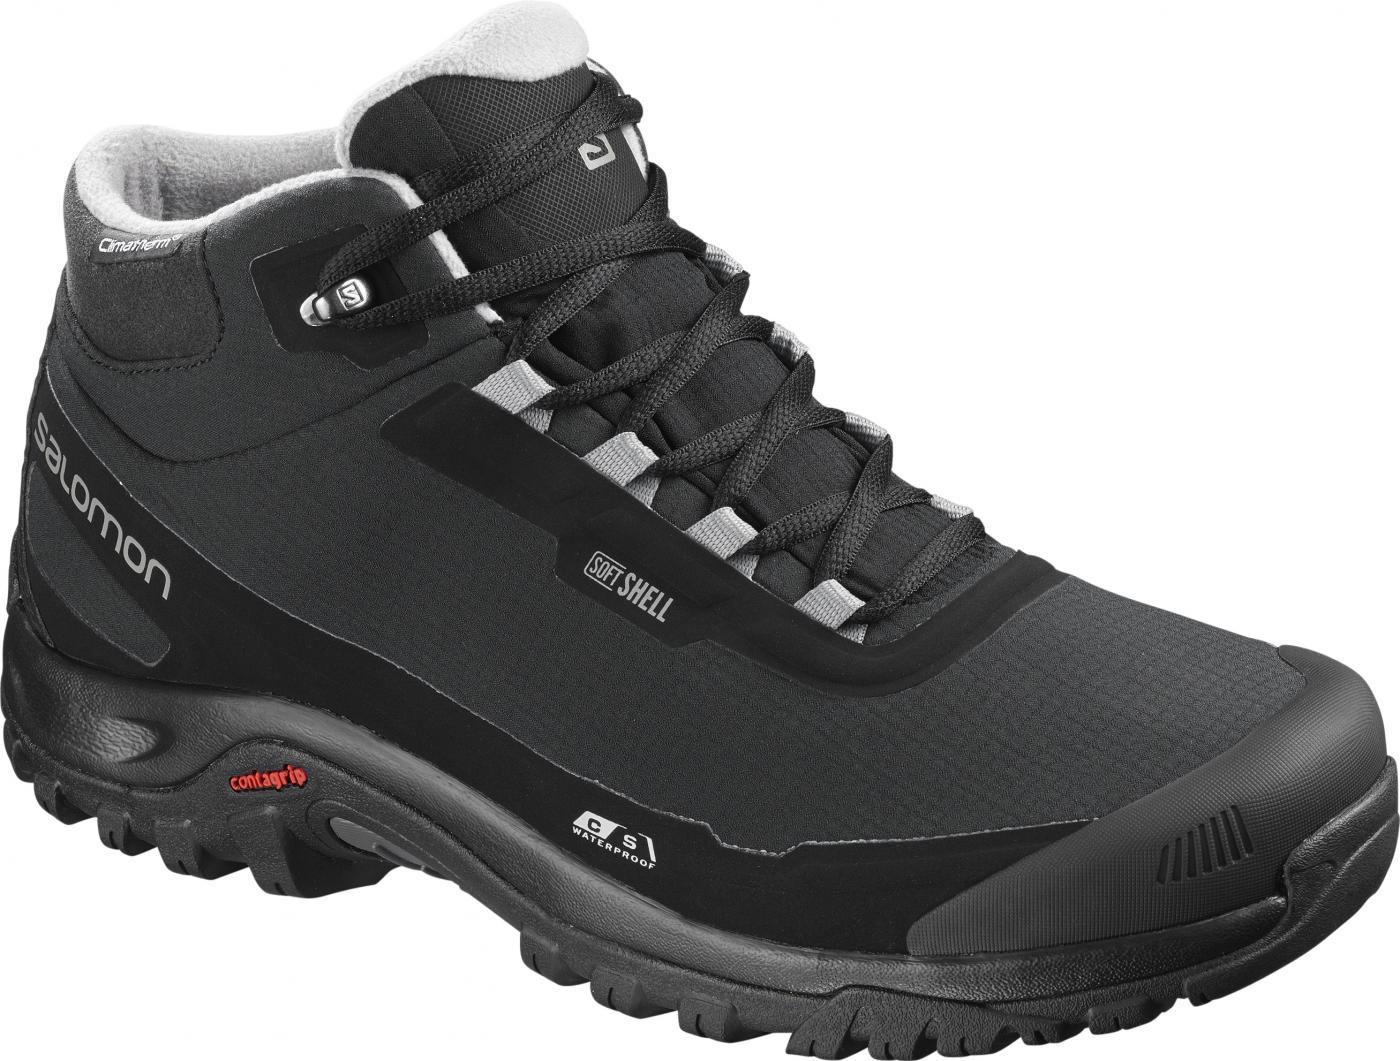 403904ed0 Zimná obuv Salomon SHELTER CS WP Bk/Bk/Frost Gray | sansport.sk